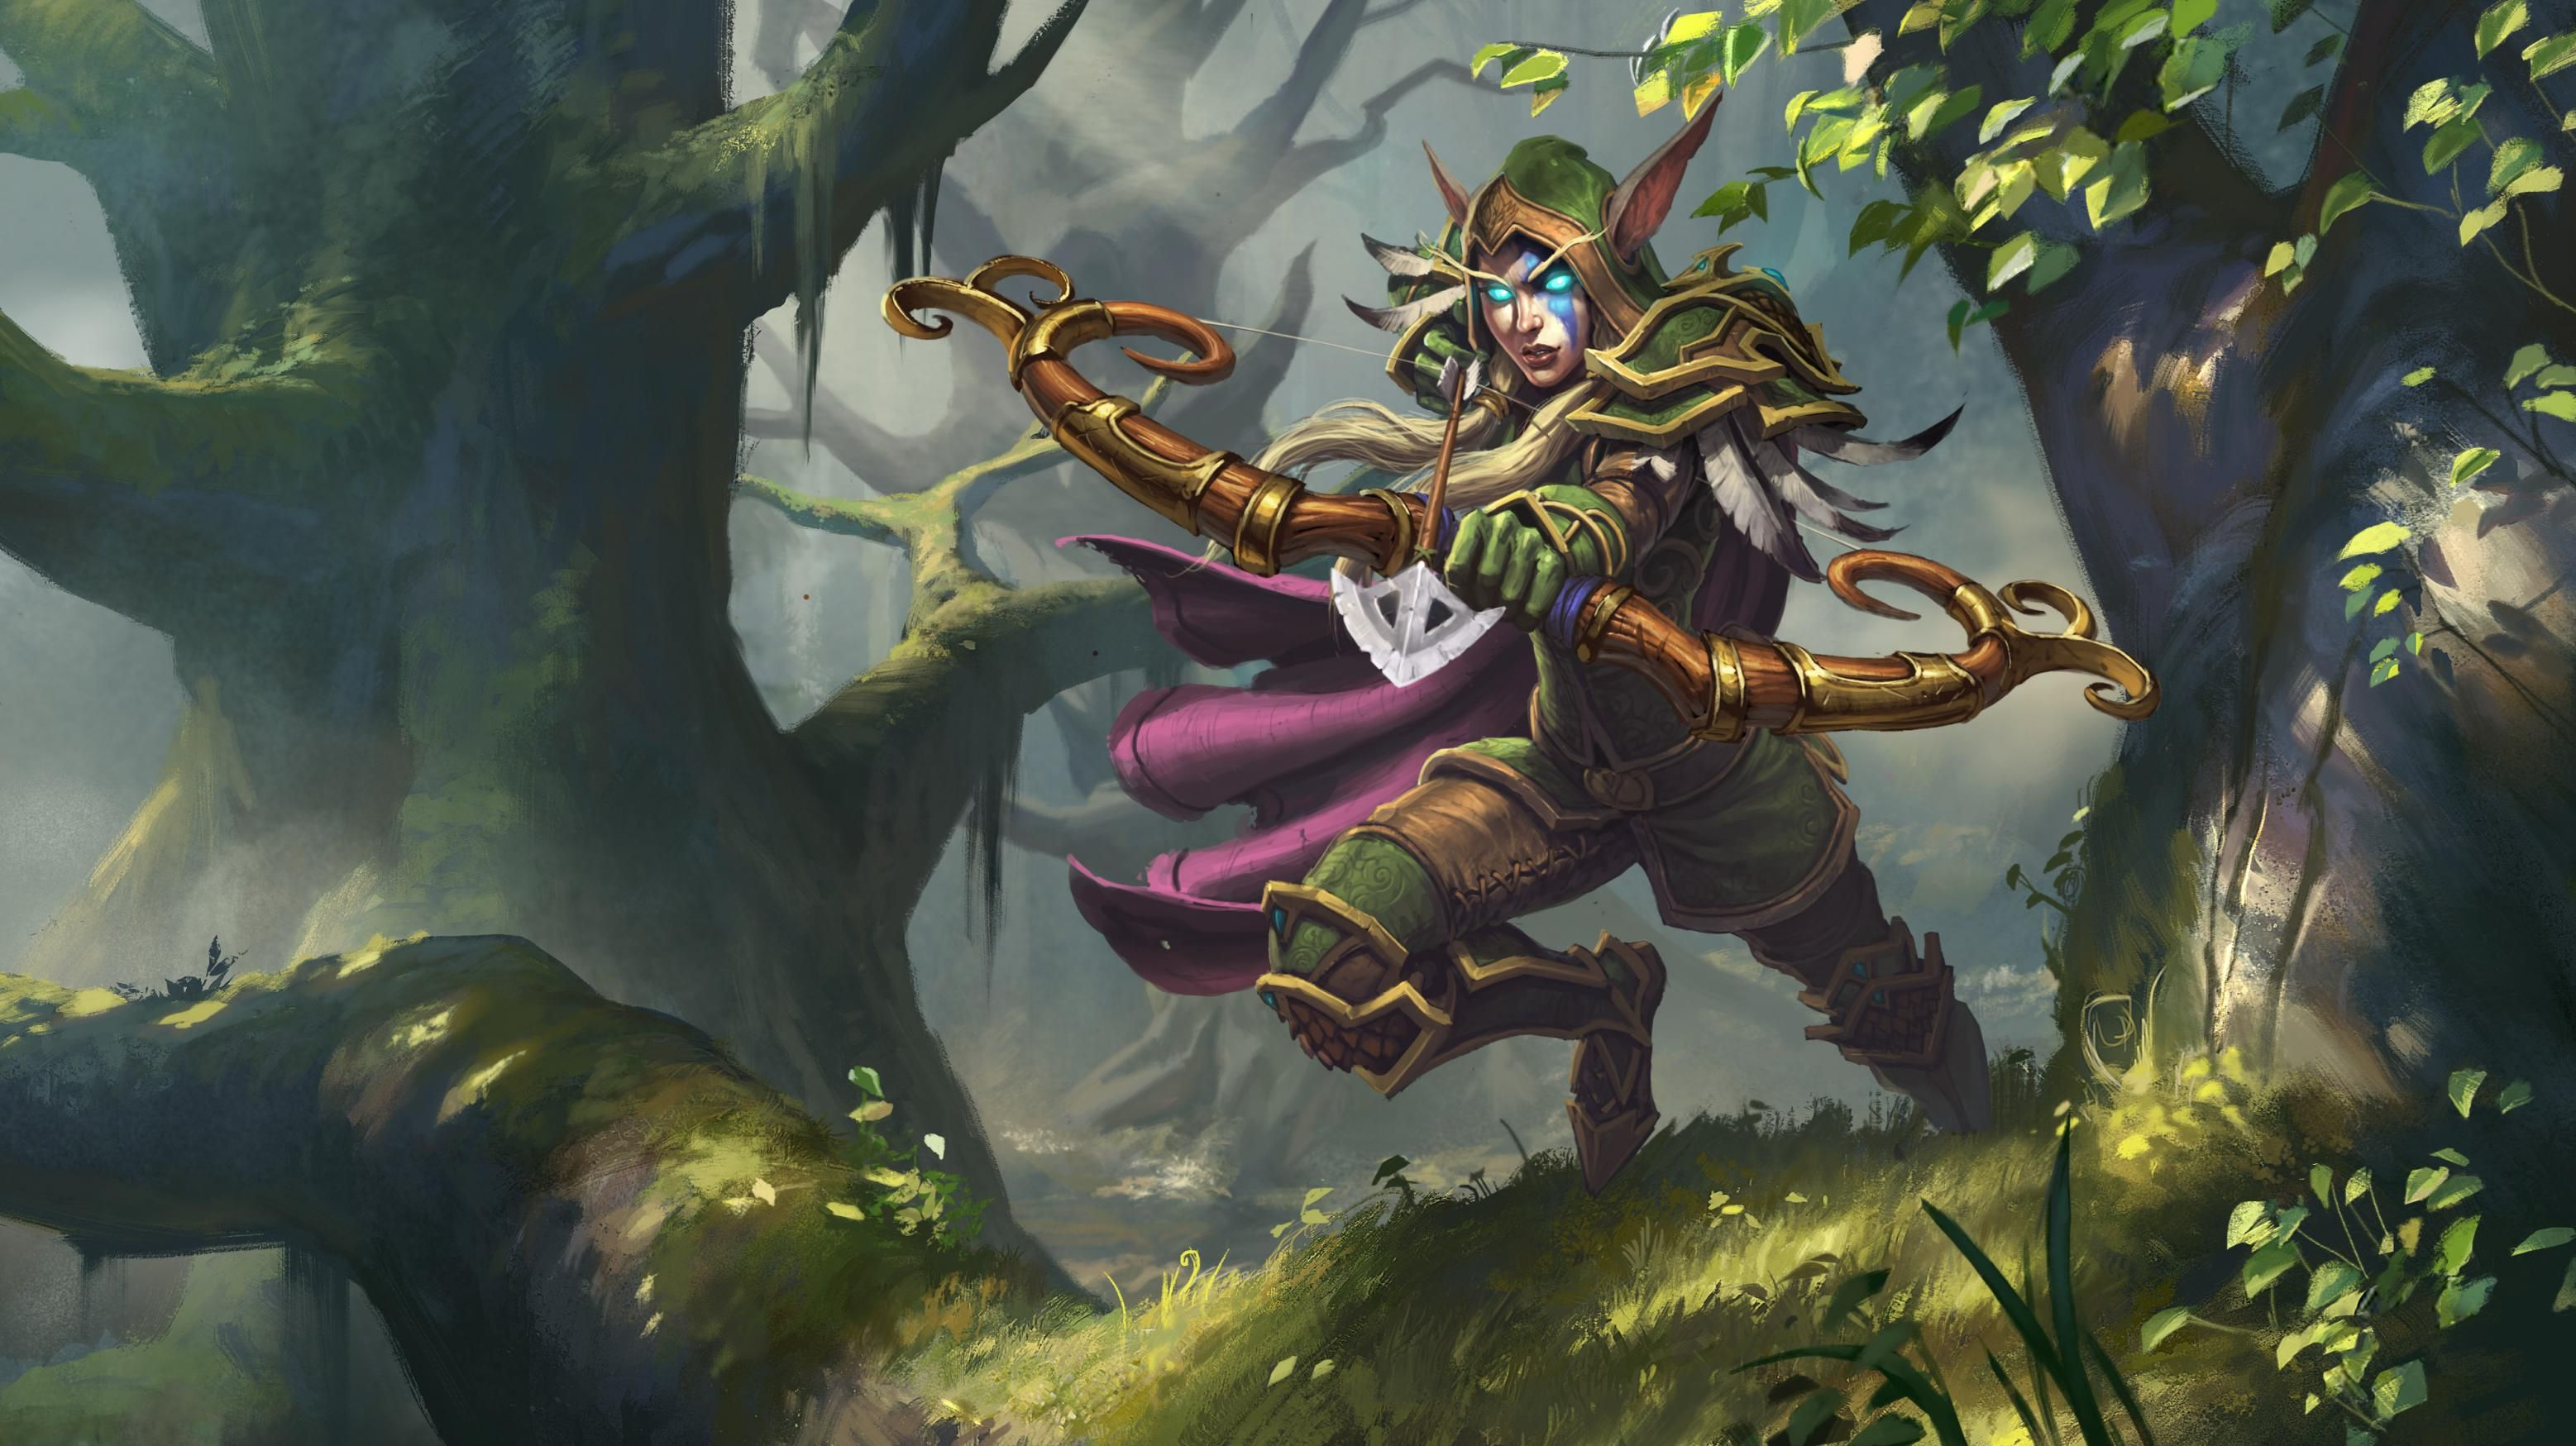 Pin by Dimitar Zlatanov on Warcraft | World of warcraft legion